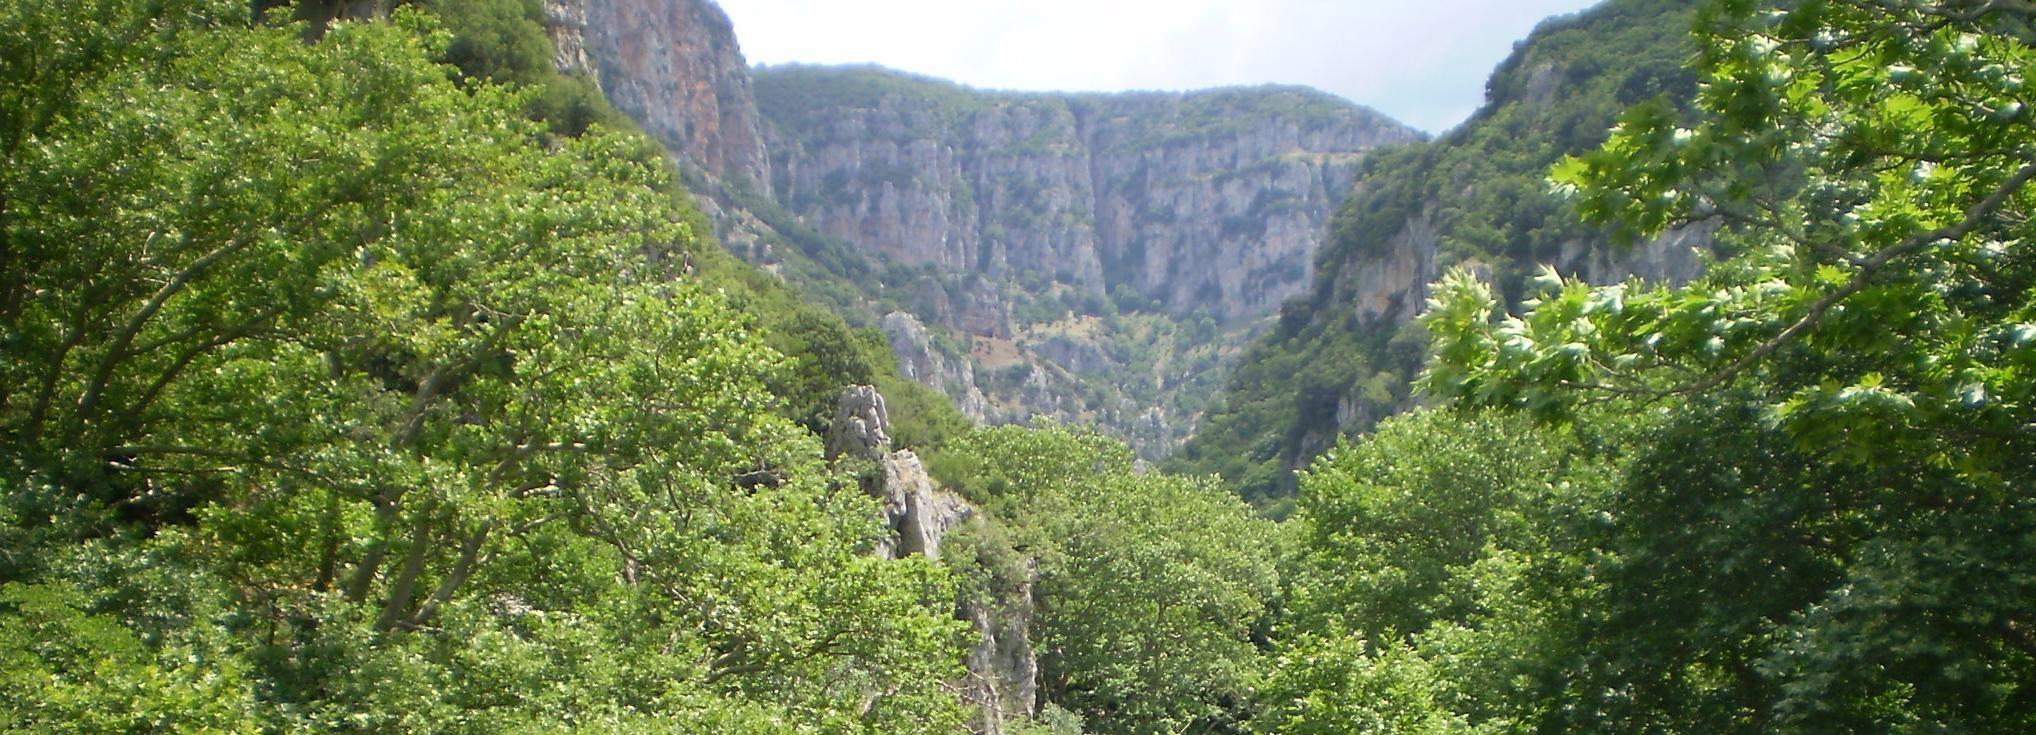 Vikos Gorge Aristi to Klidonia Bridge 3-Hour Hike